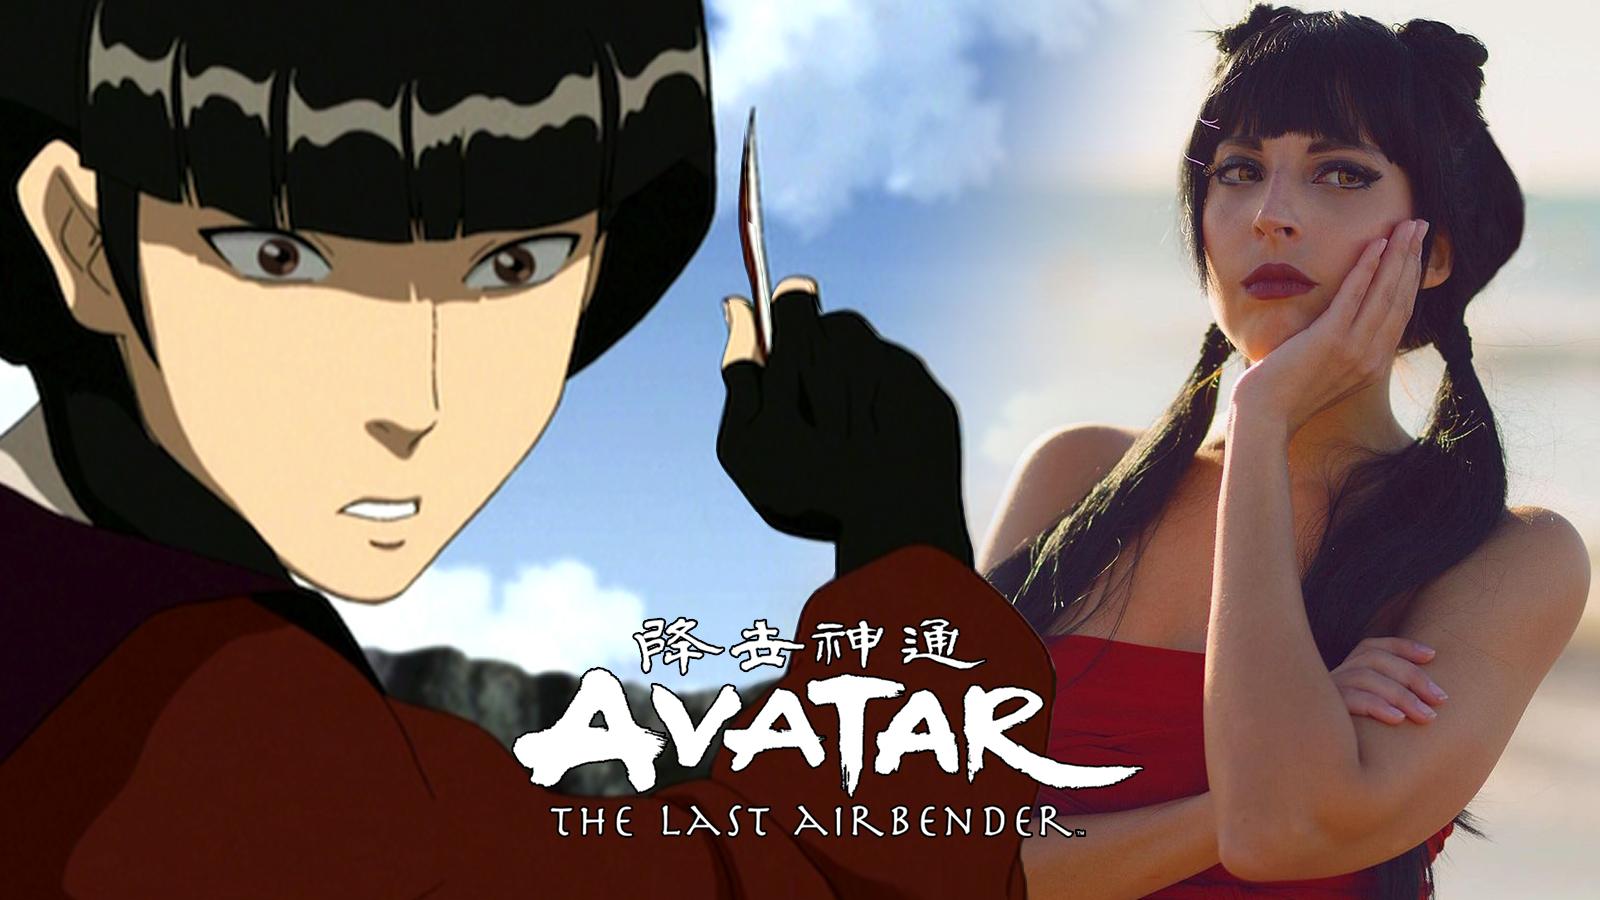 mai avatar the last Airbender cosplay